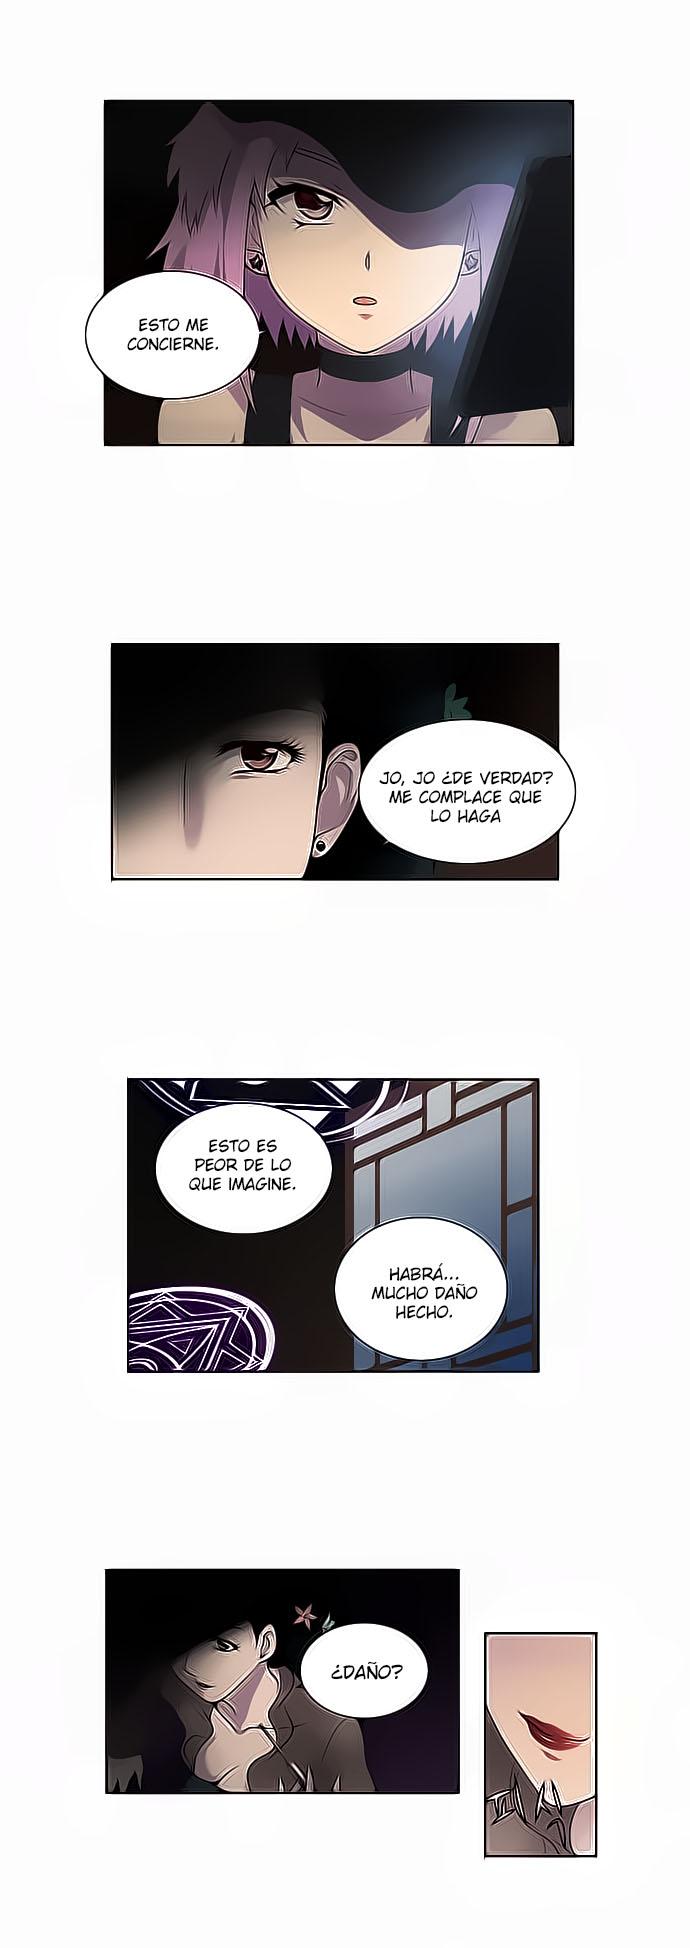 http://c5.ninemanga.com/es_manga/61/1725/434275/f7fce47a8468f42b347af74fe2a9dff0.jpg Page 7